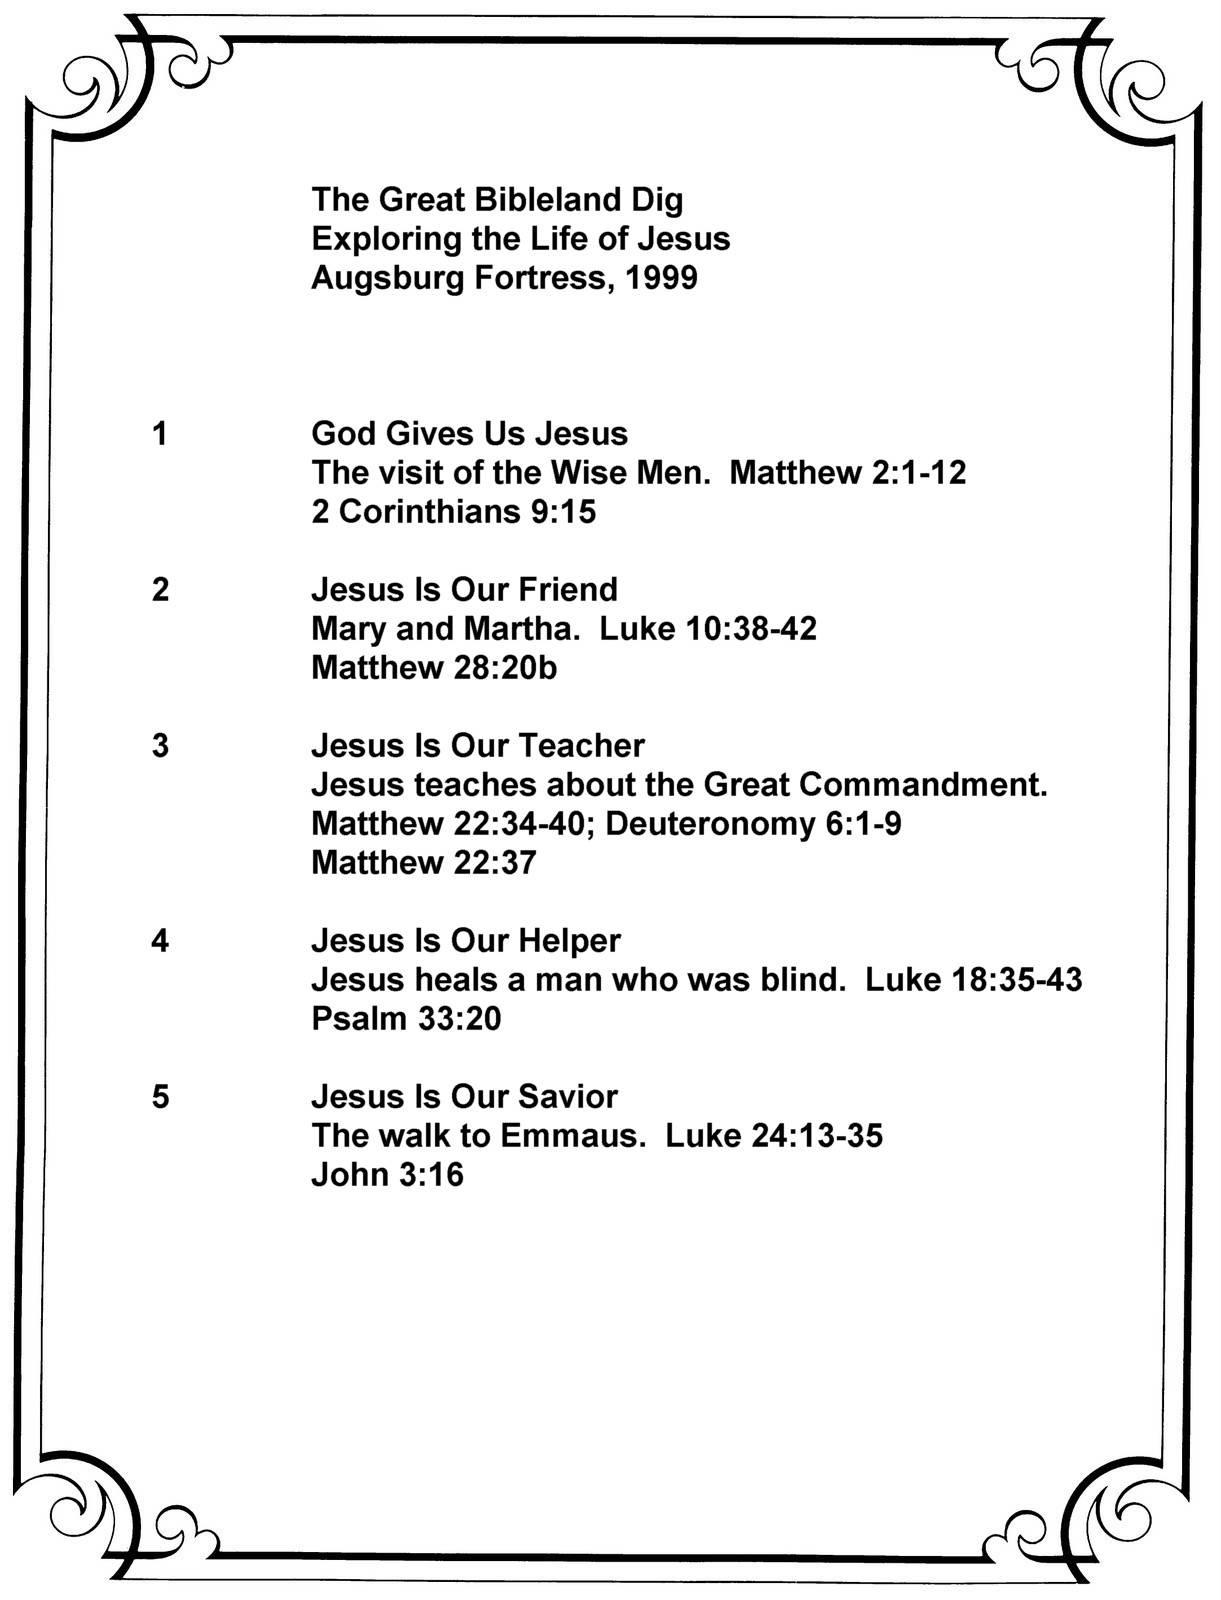 Great Bibleland Dig Summary